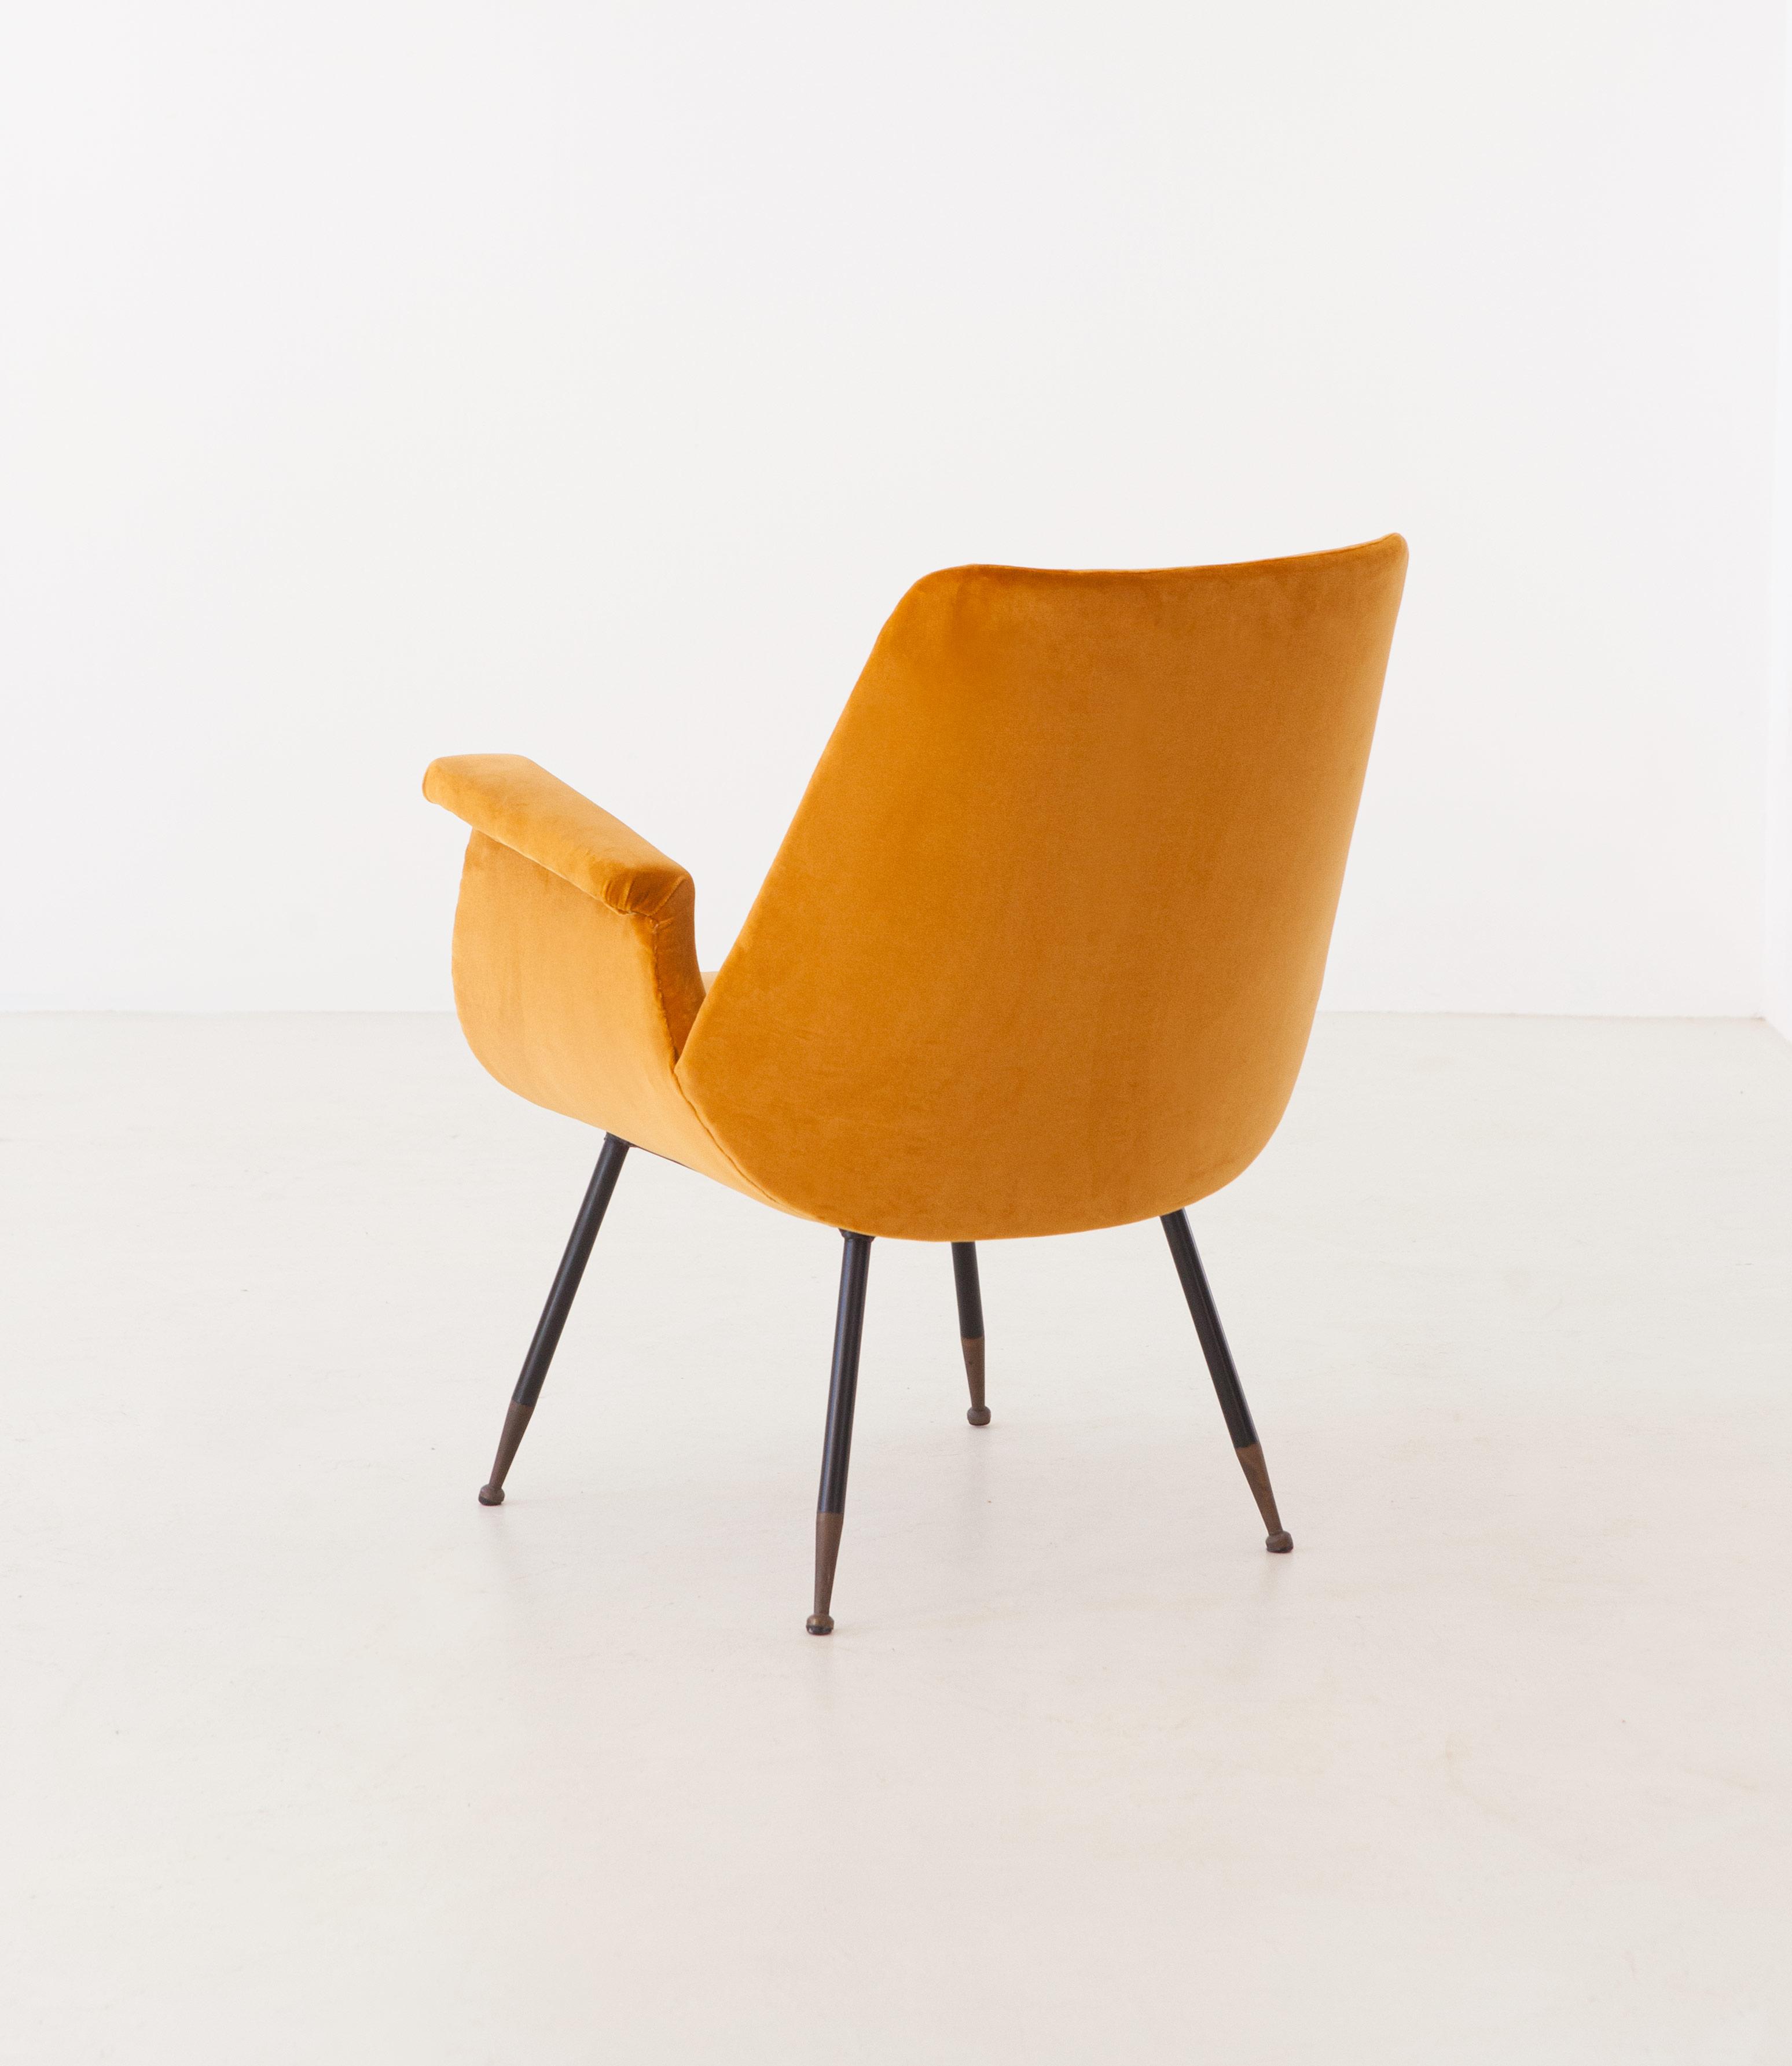 1950s-gastone-rinaldi-yellow-velvet-lounge-armchair-7-se316